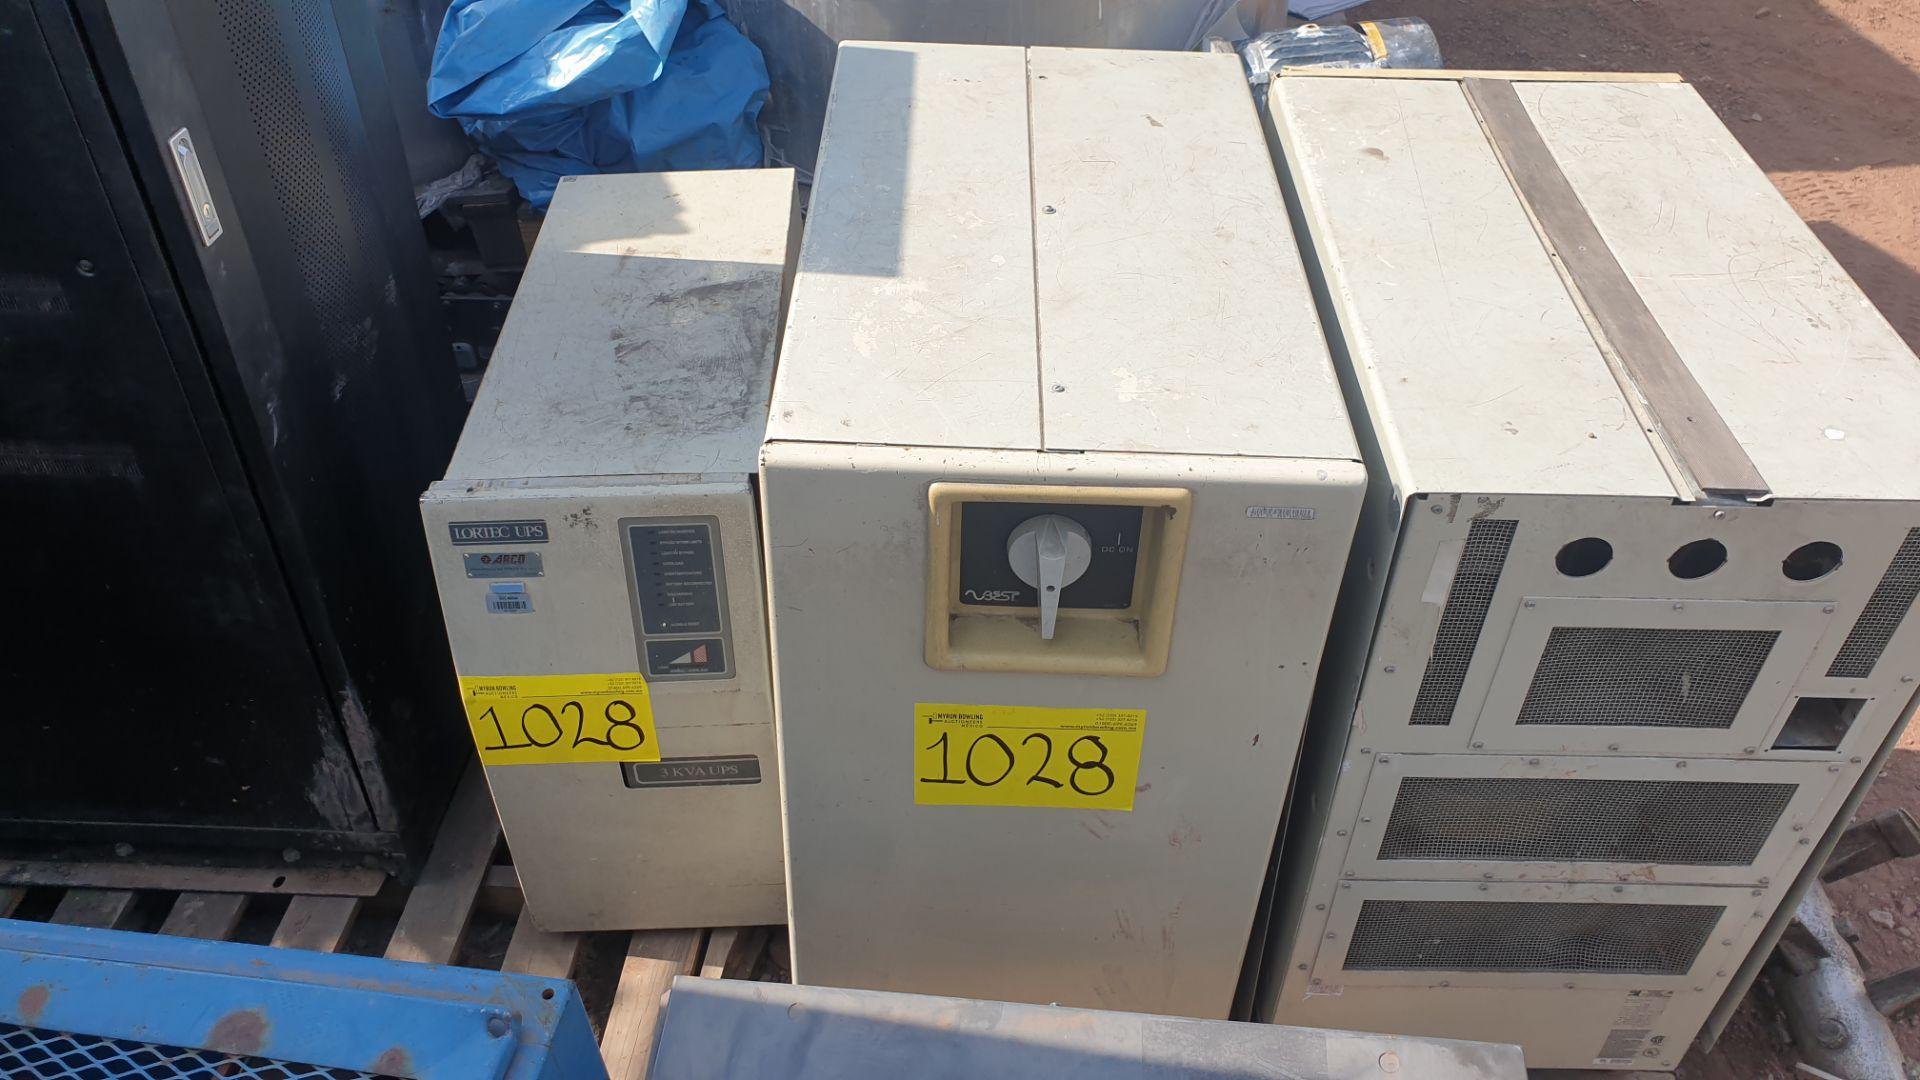 1 Ferrups Power bank system model FD10KVA 208-240V includes Lortec UPS of 3KVA - Image 11 of 11